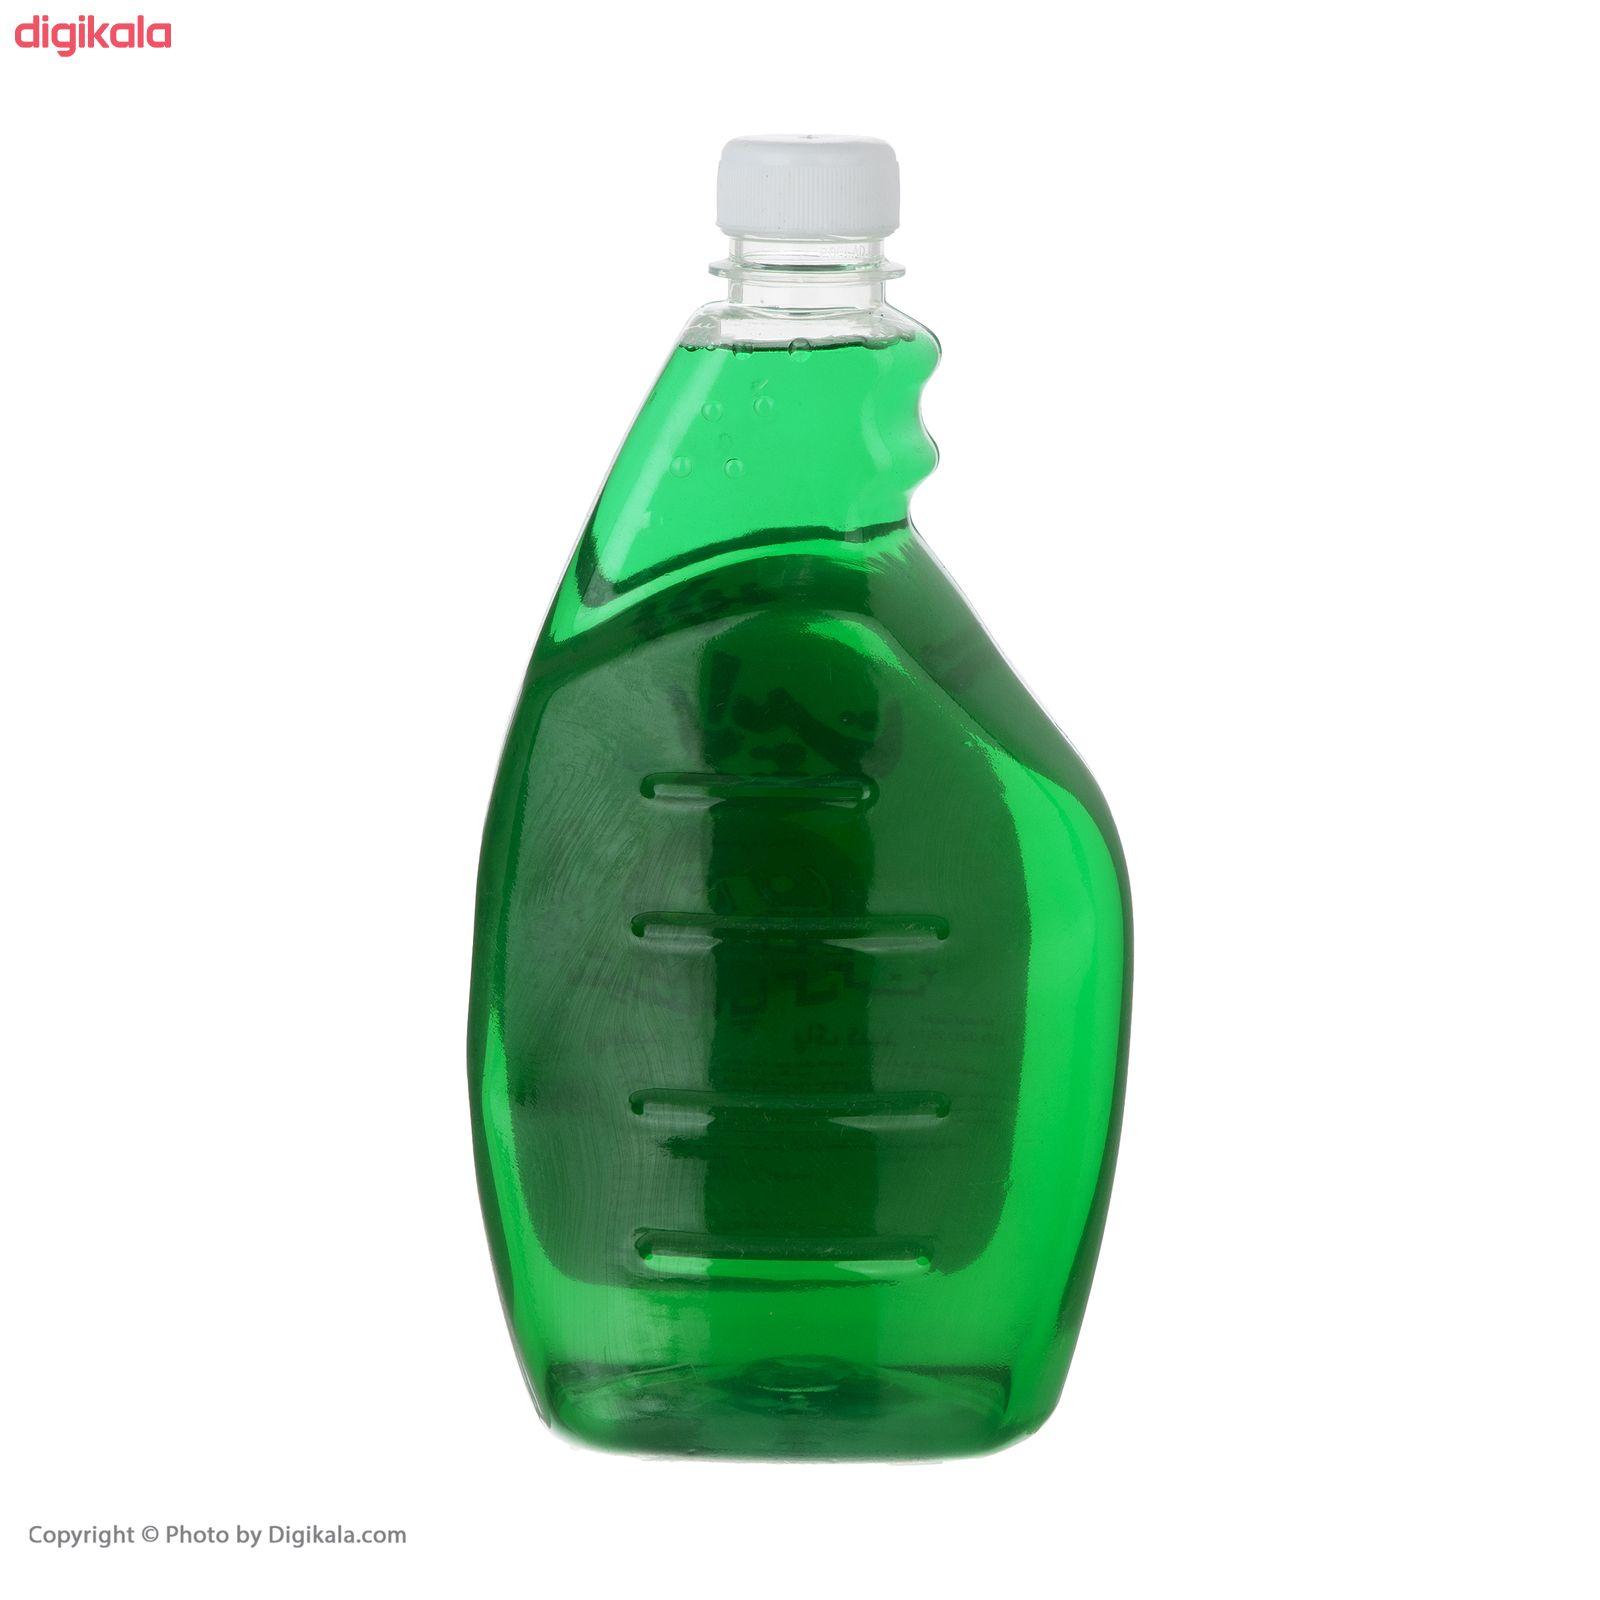 شیشه پاک کن من کد 01 حجم 1 لیتر مجموعه 2 عددی  main 1 23